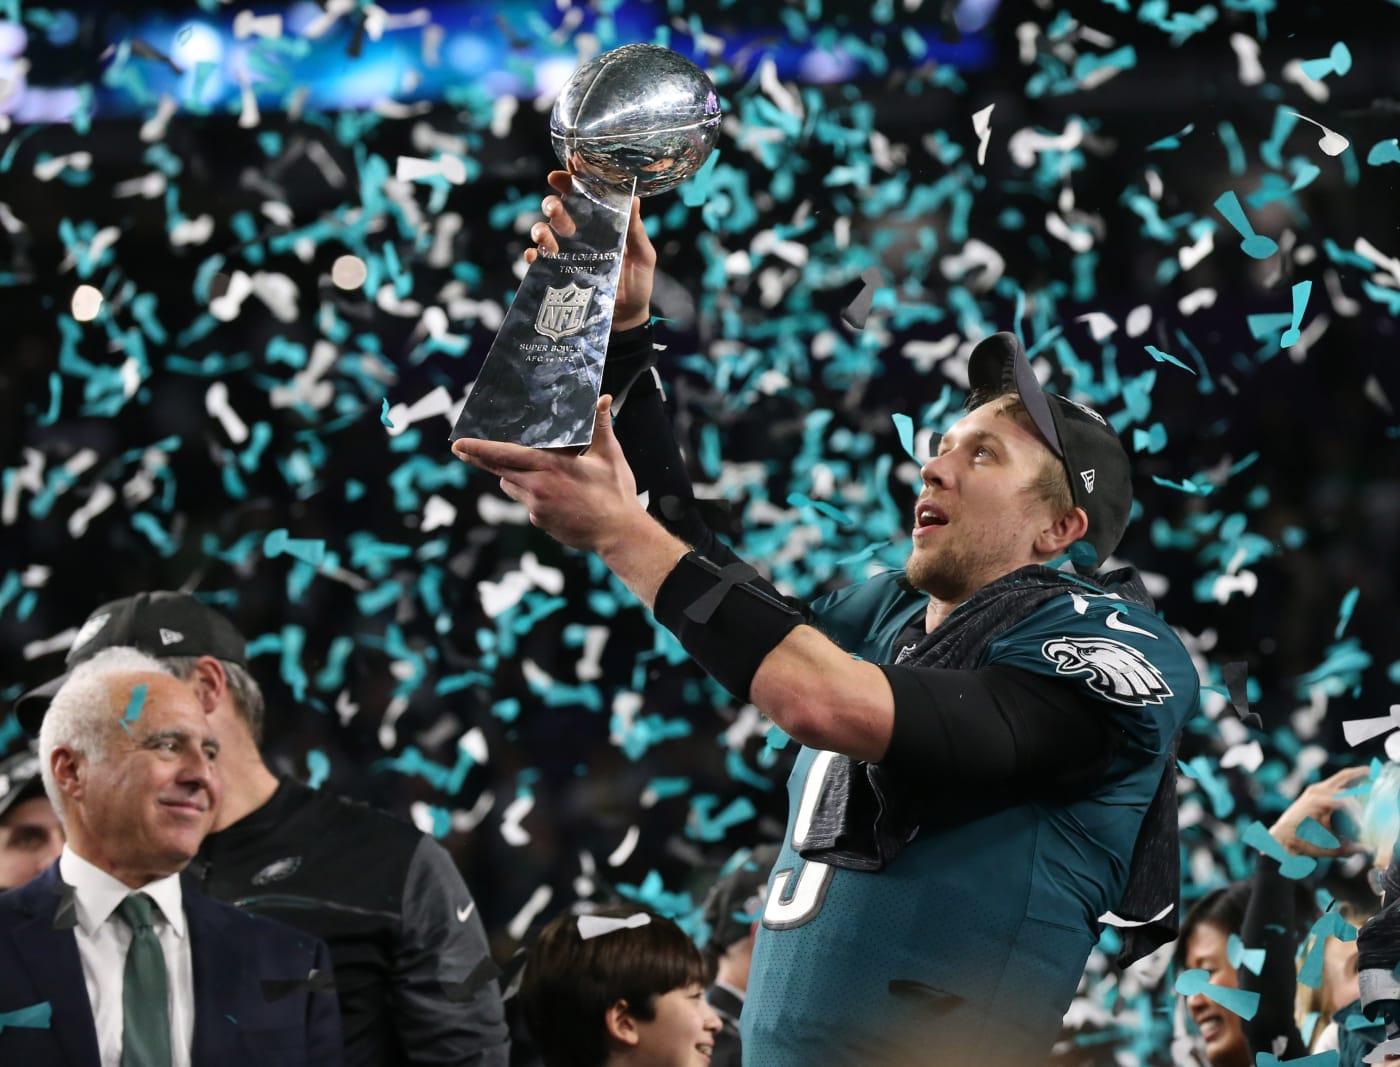 Nick Foles Super Bowl MVP 2018